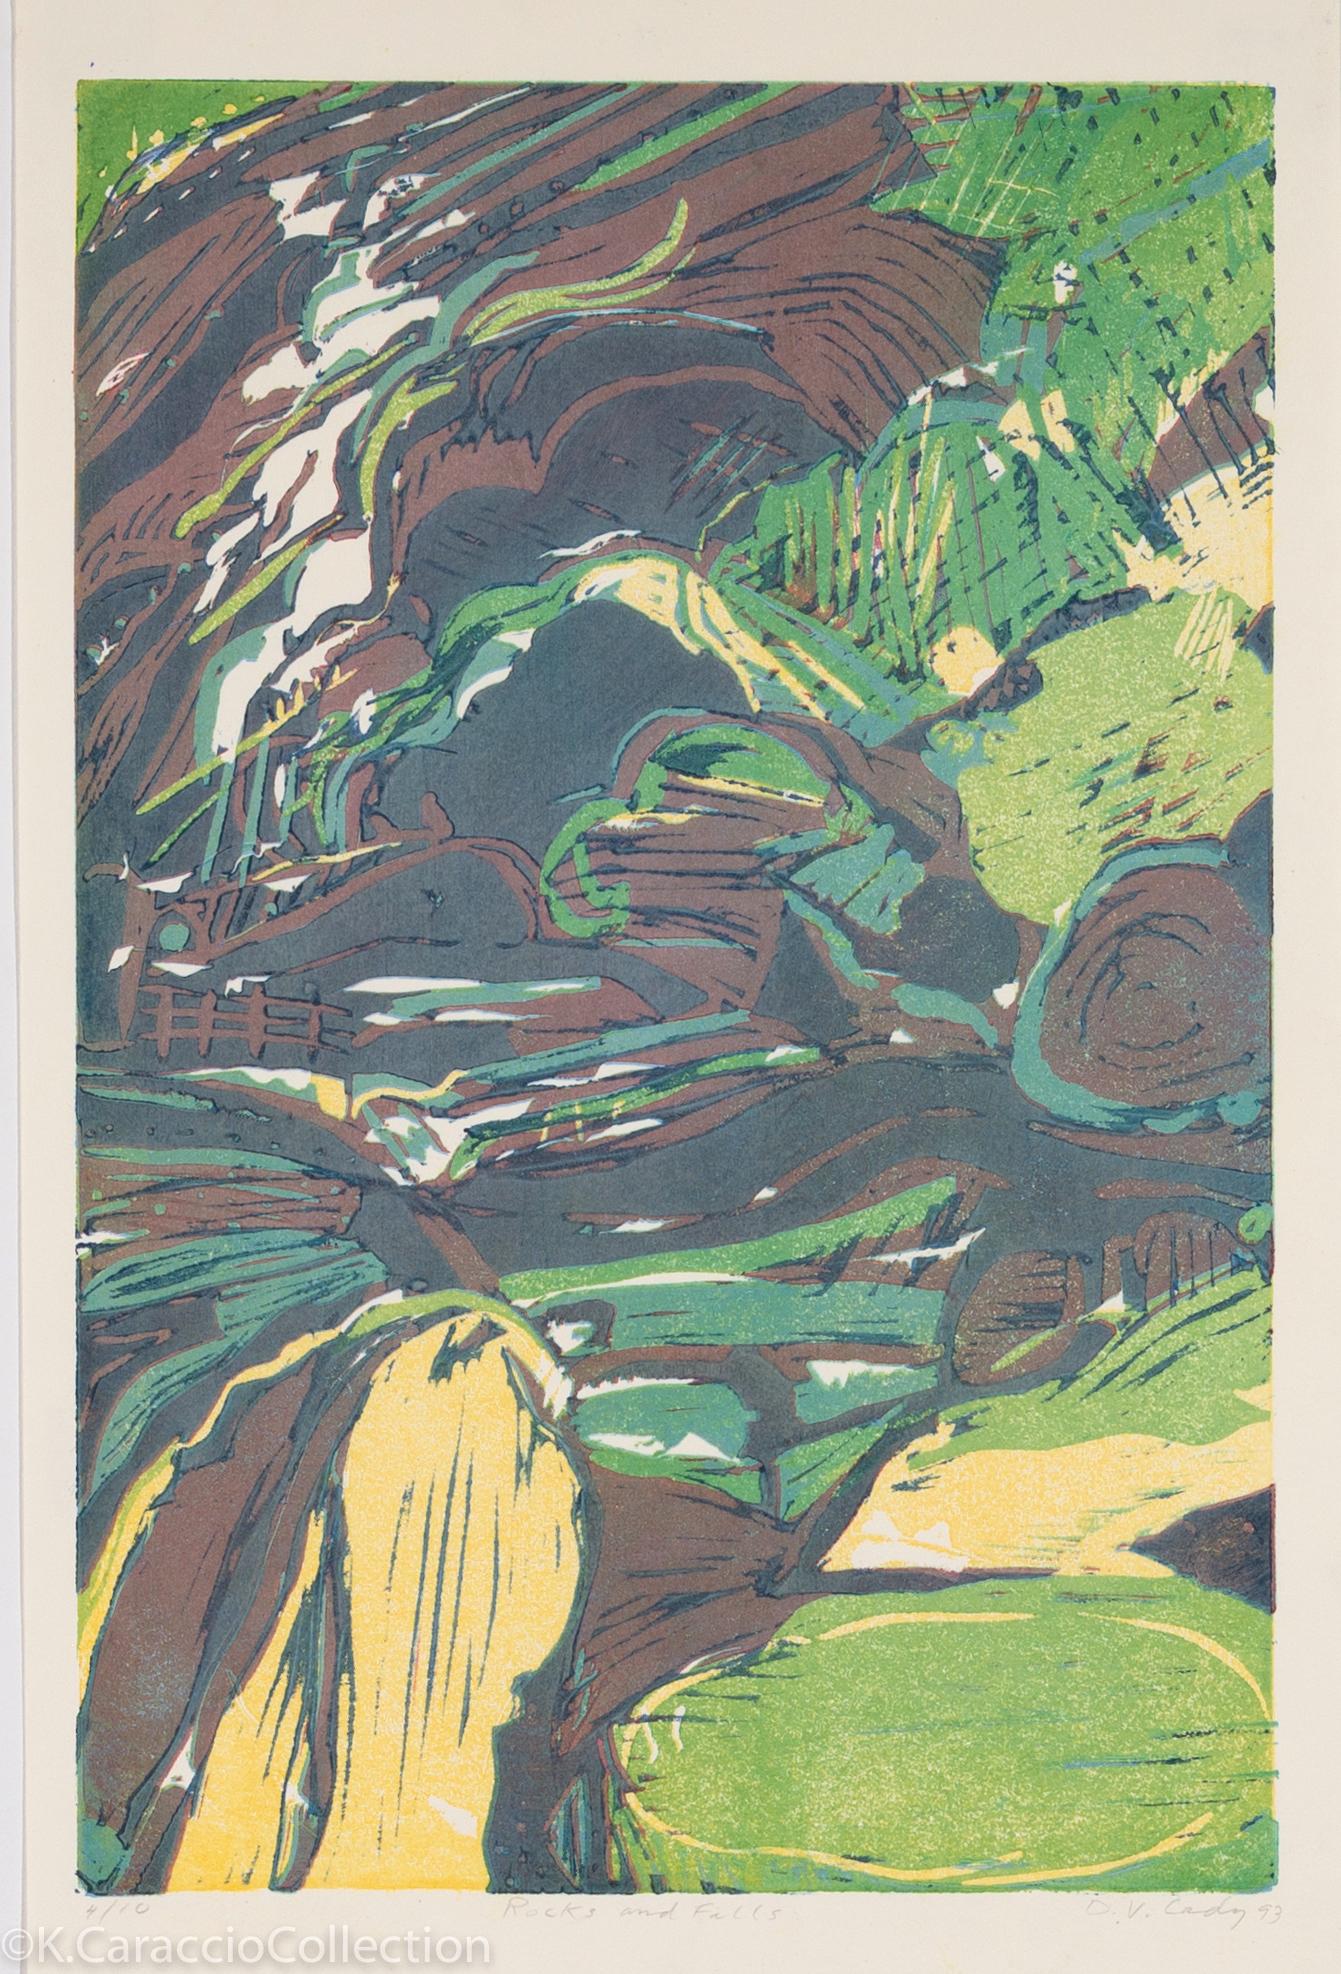 Rocks and Falls, 1994